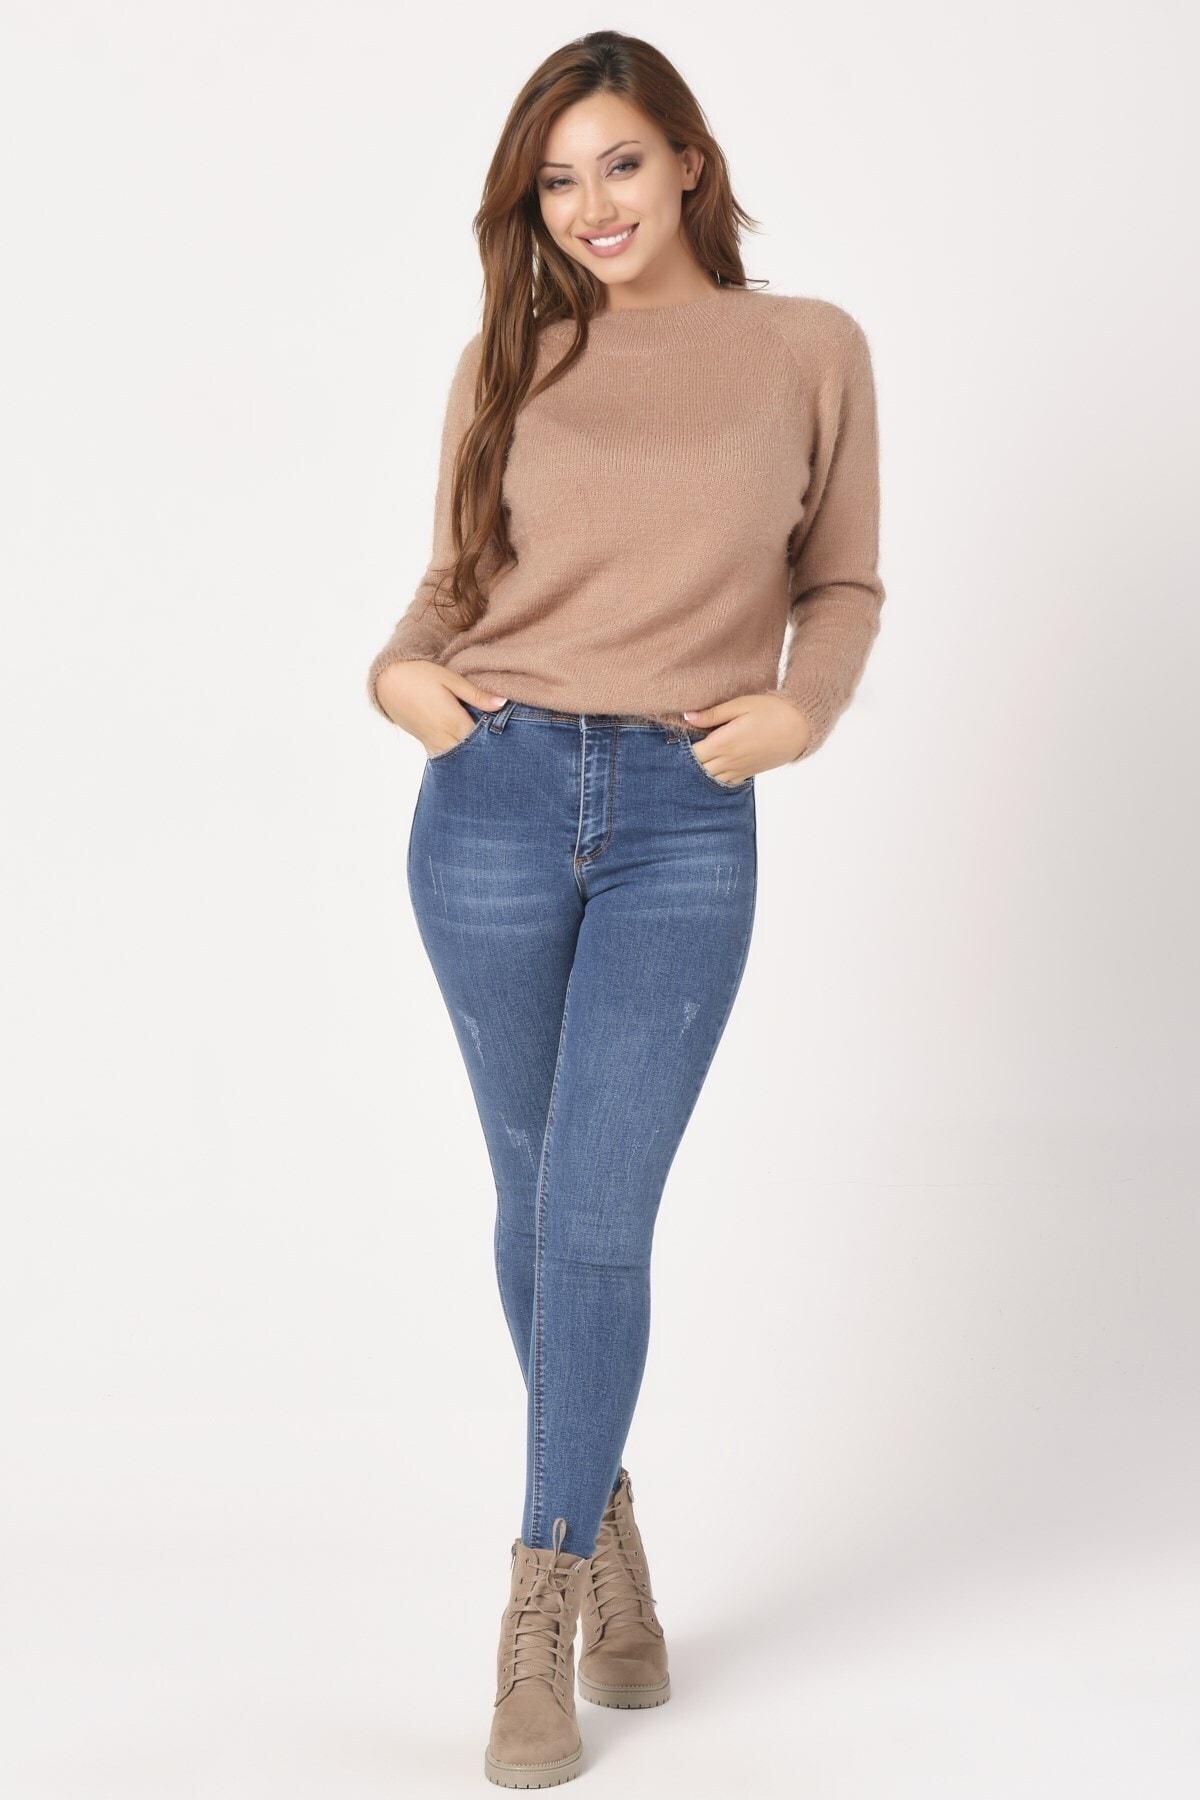 KETEEN Kadın Mavi Dar Paça Mira Bilek Kot Pantolon 1